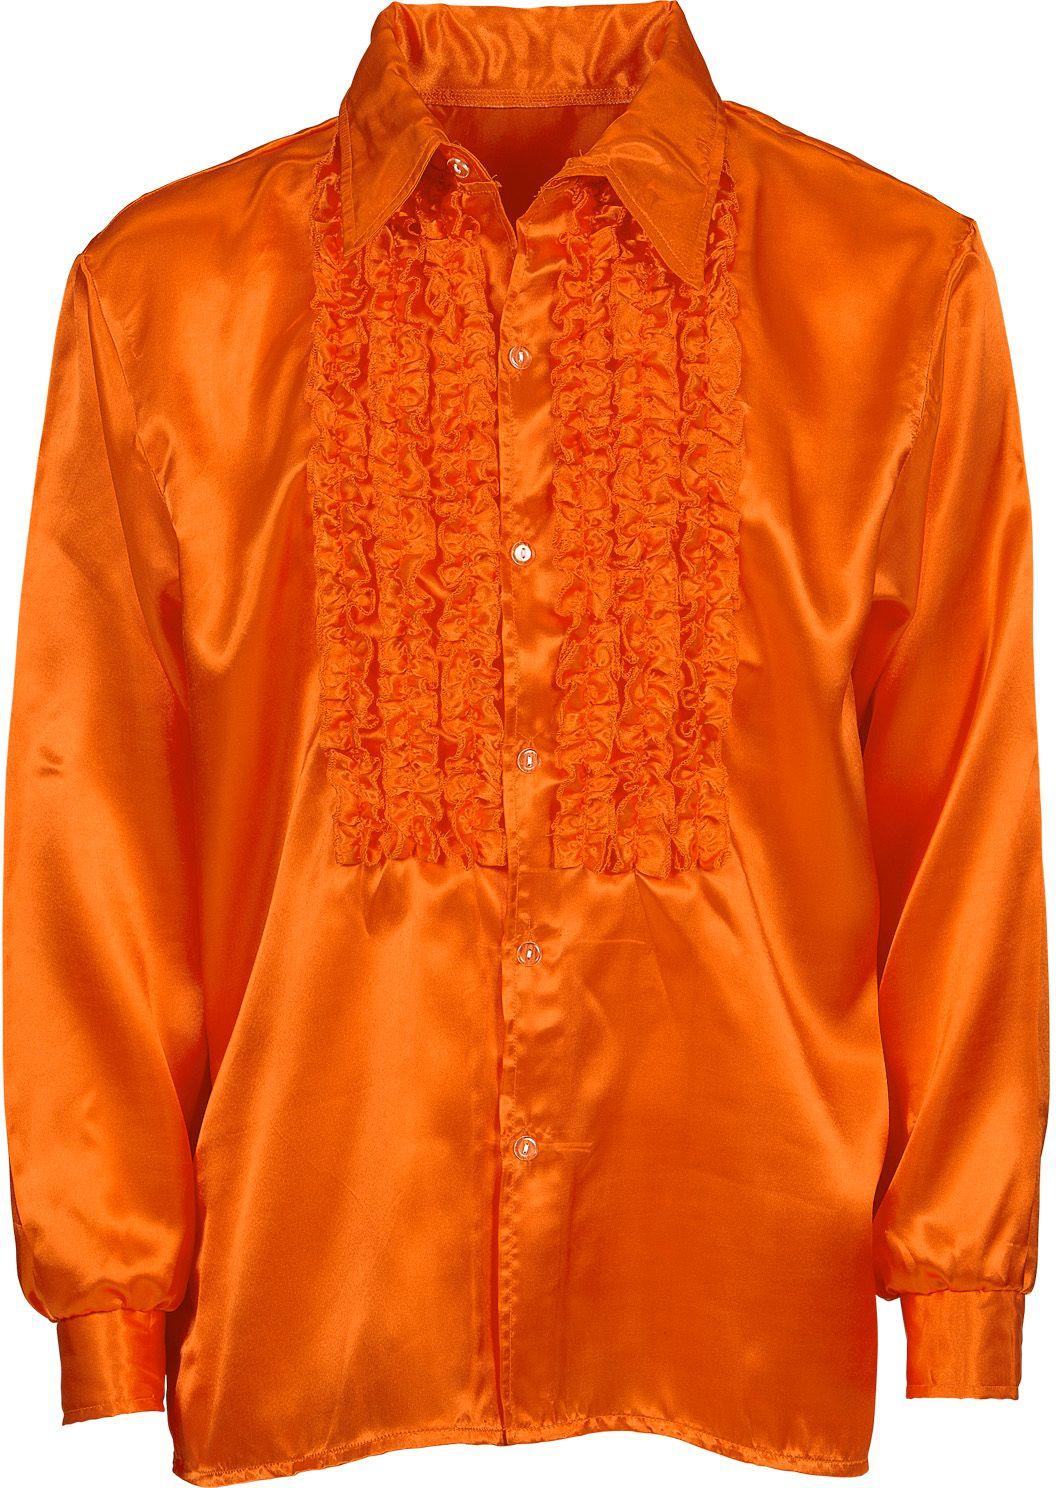 Oranje satijnen rouchen blouse